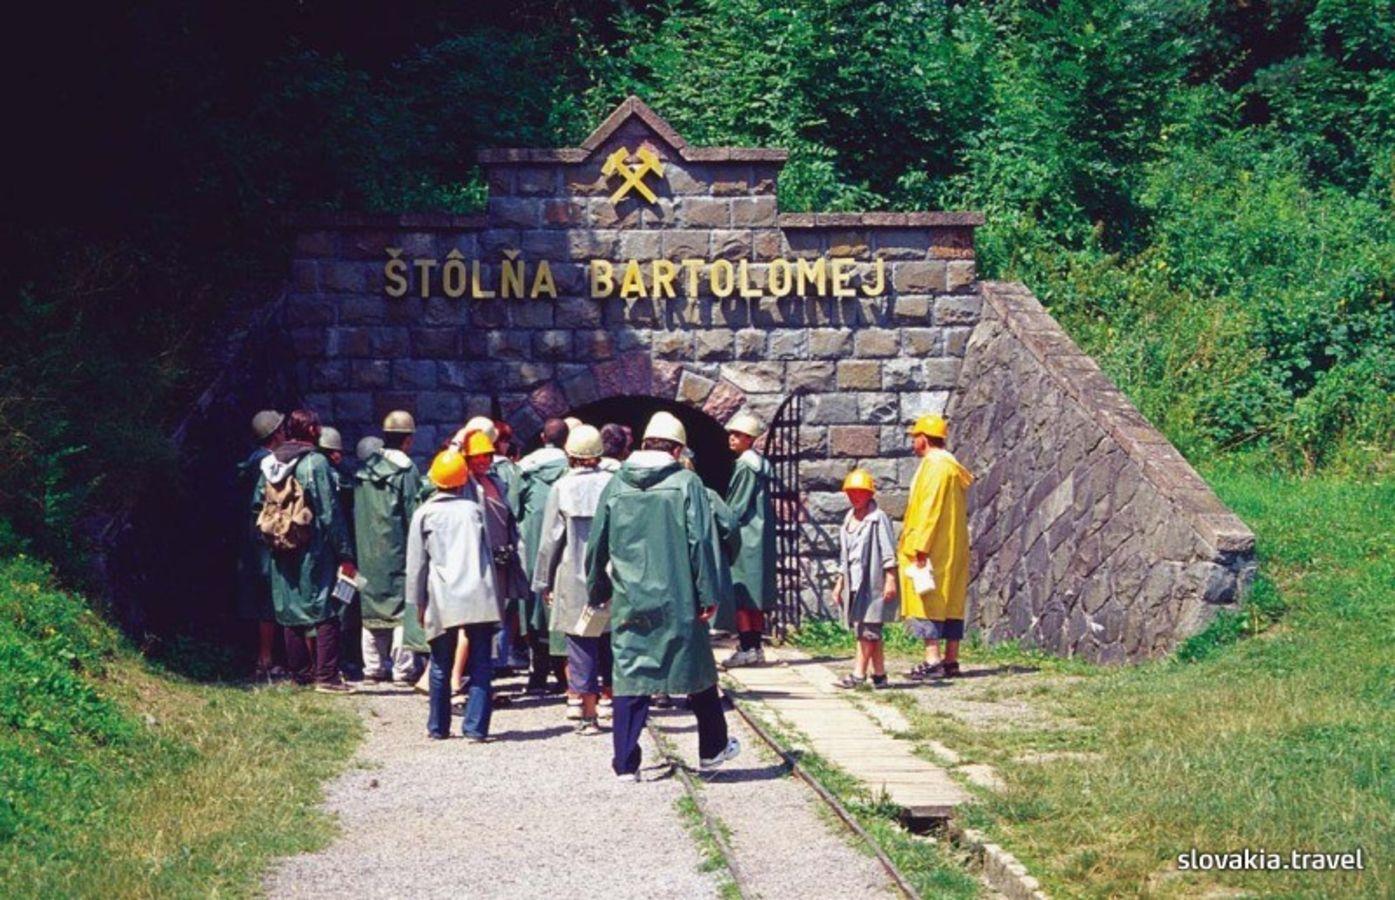 Mining monuments in Banská Štiavnica - Slovakia travel